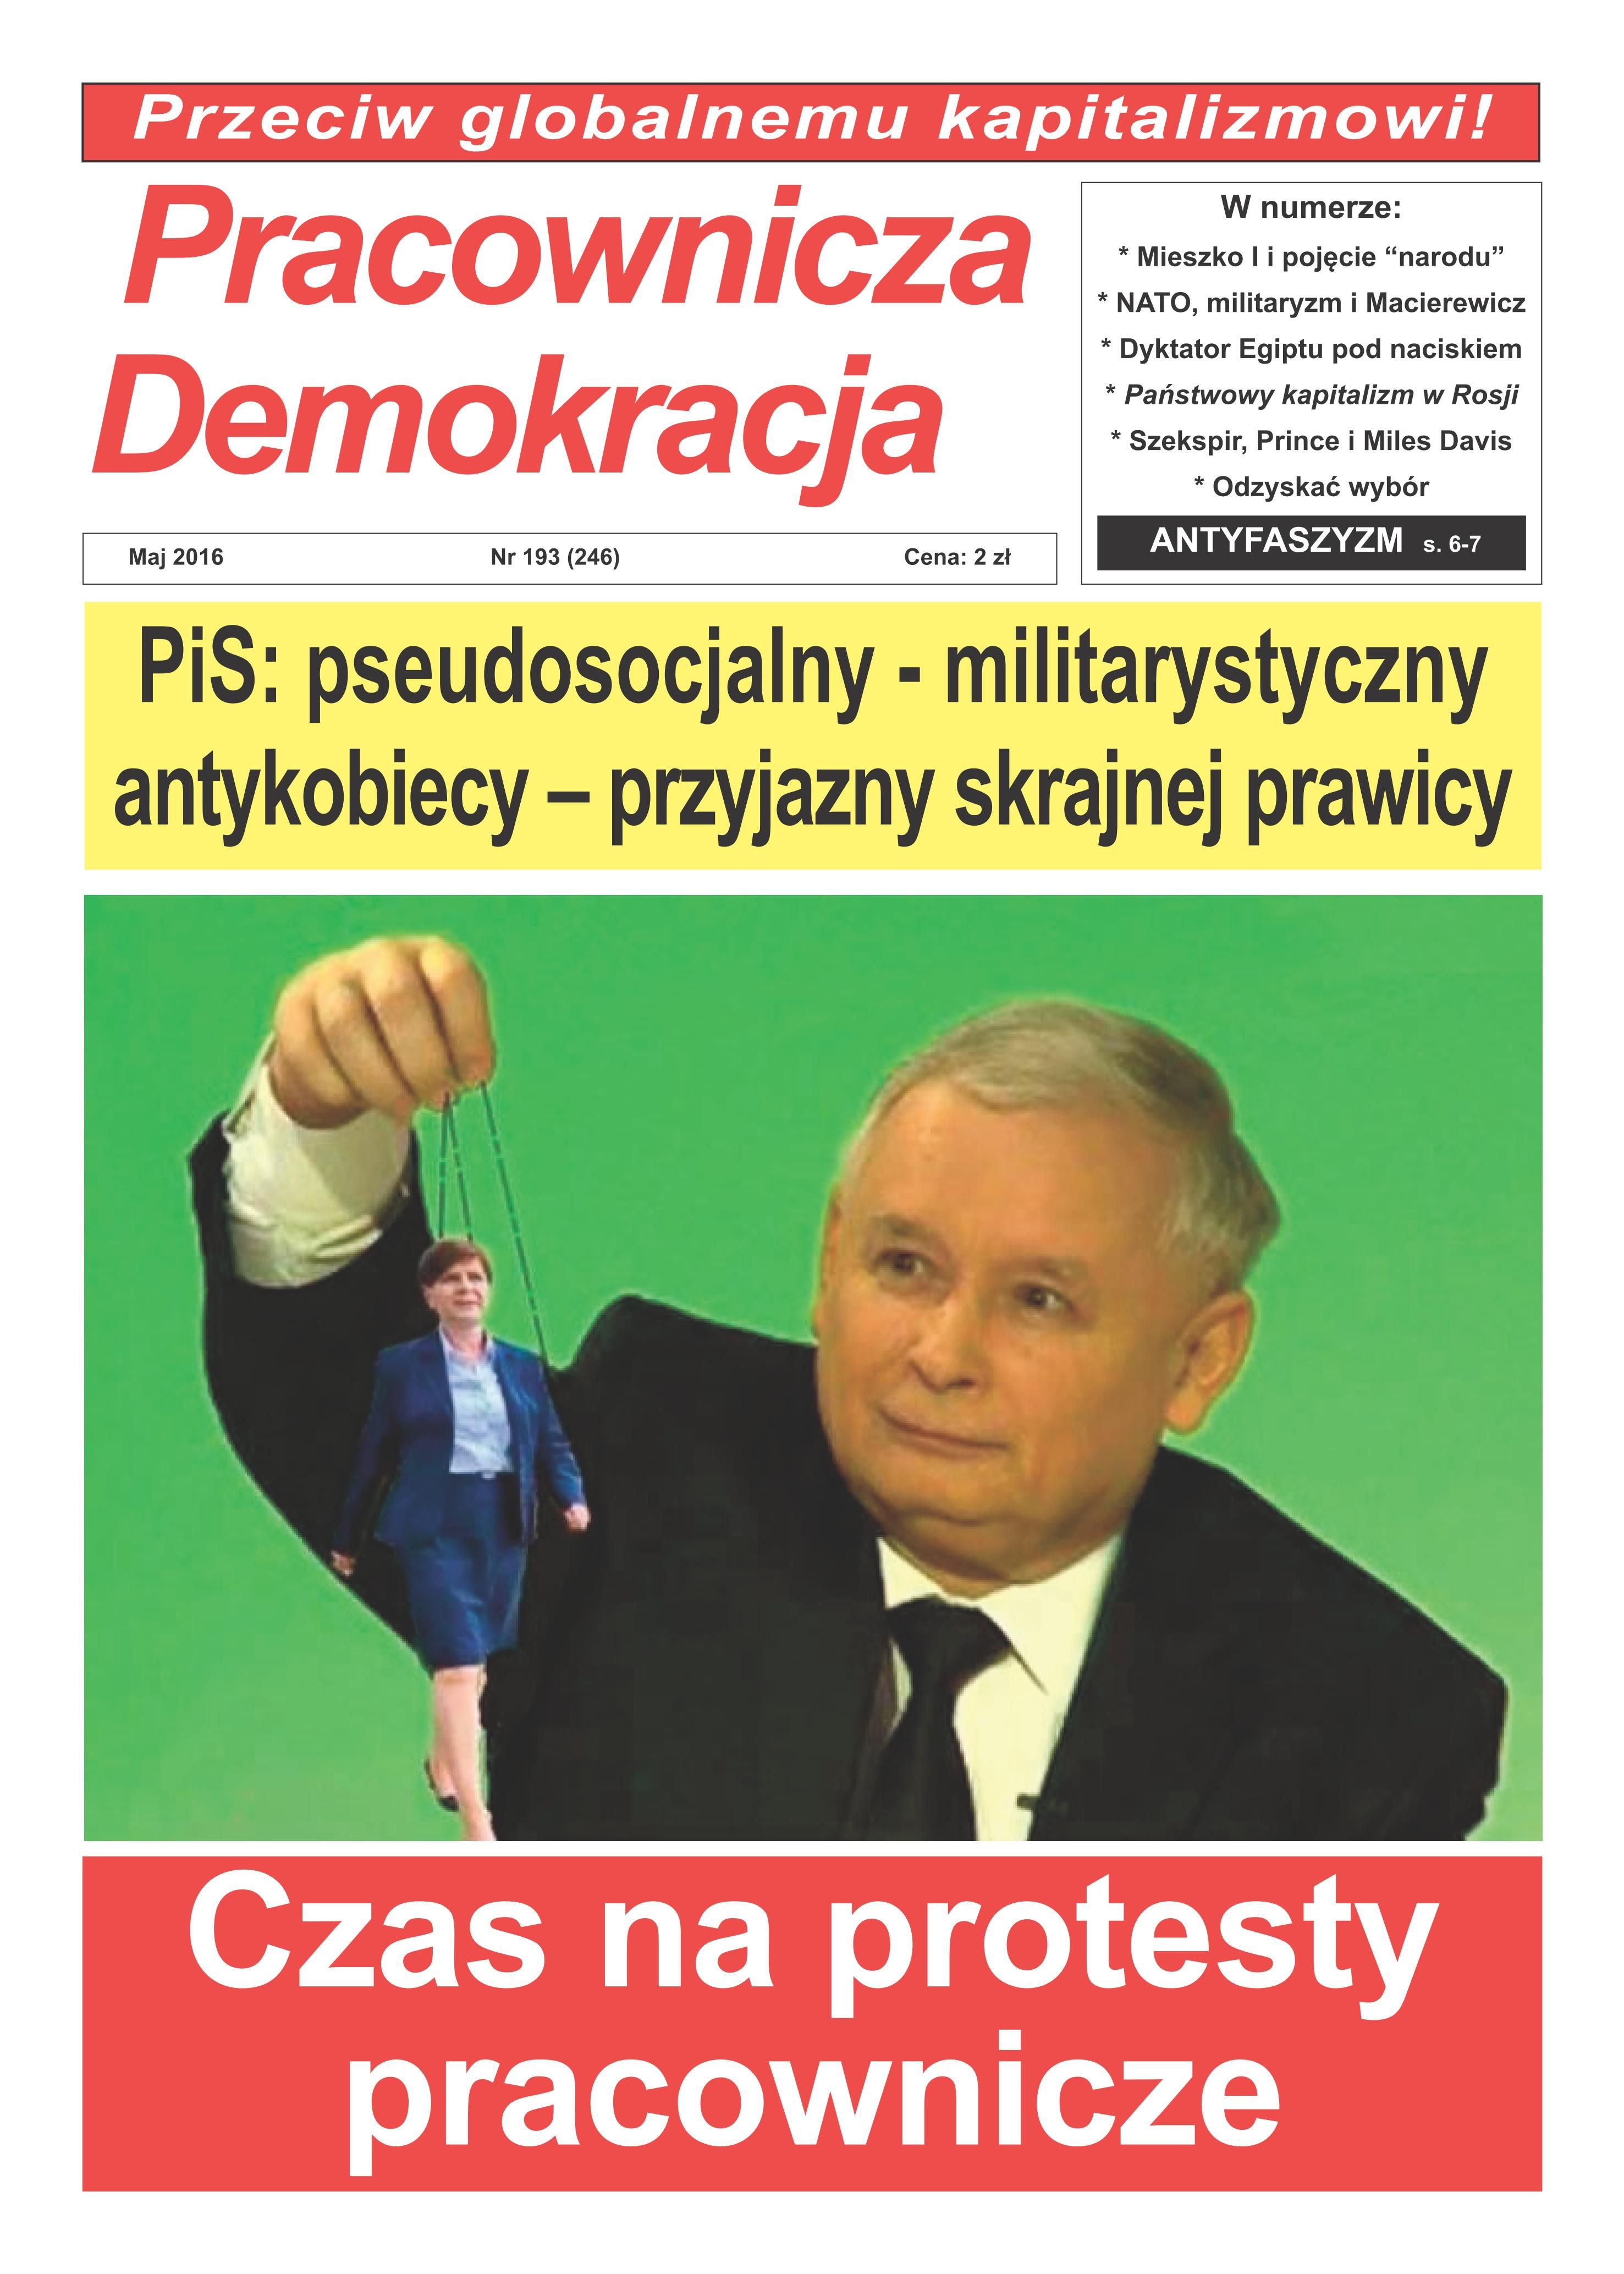 strona 1 - gazeta 05.2016